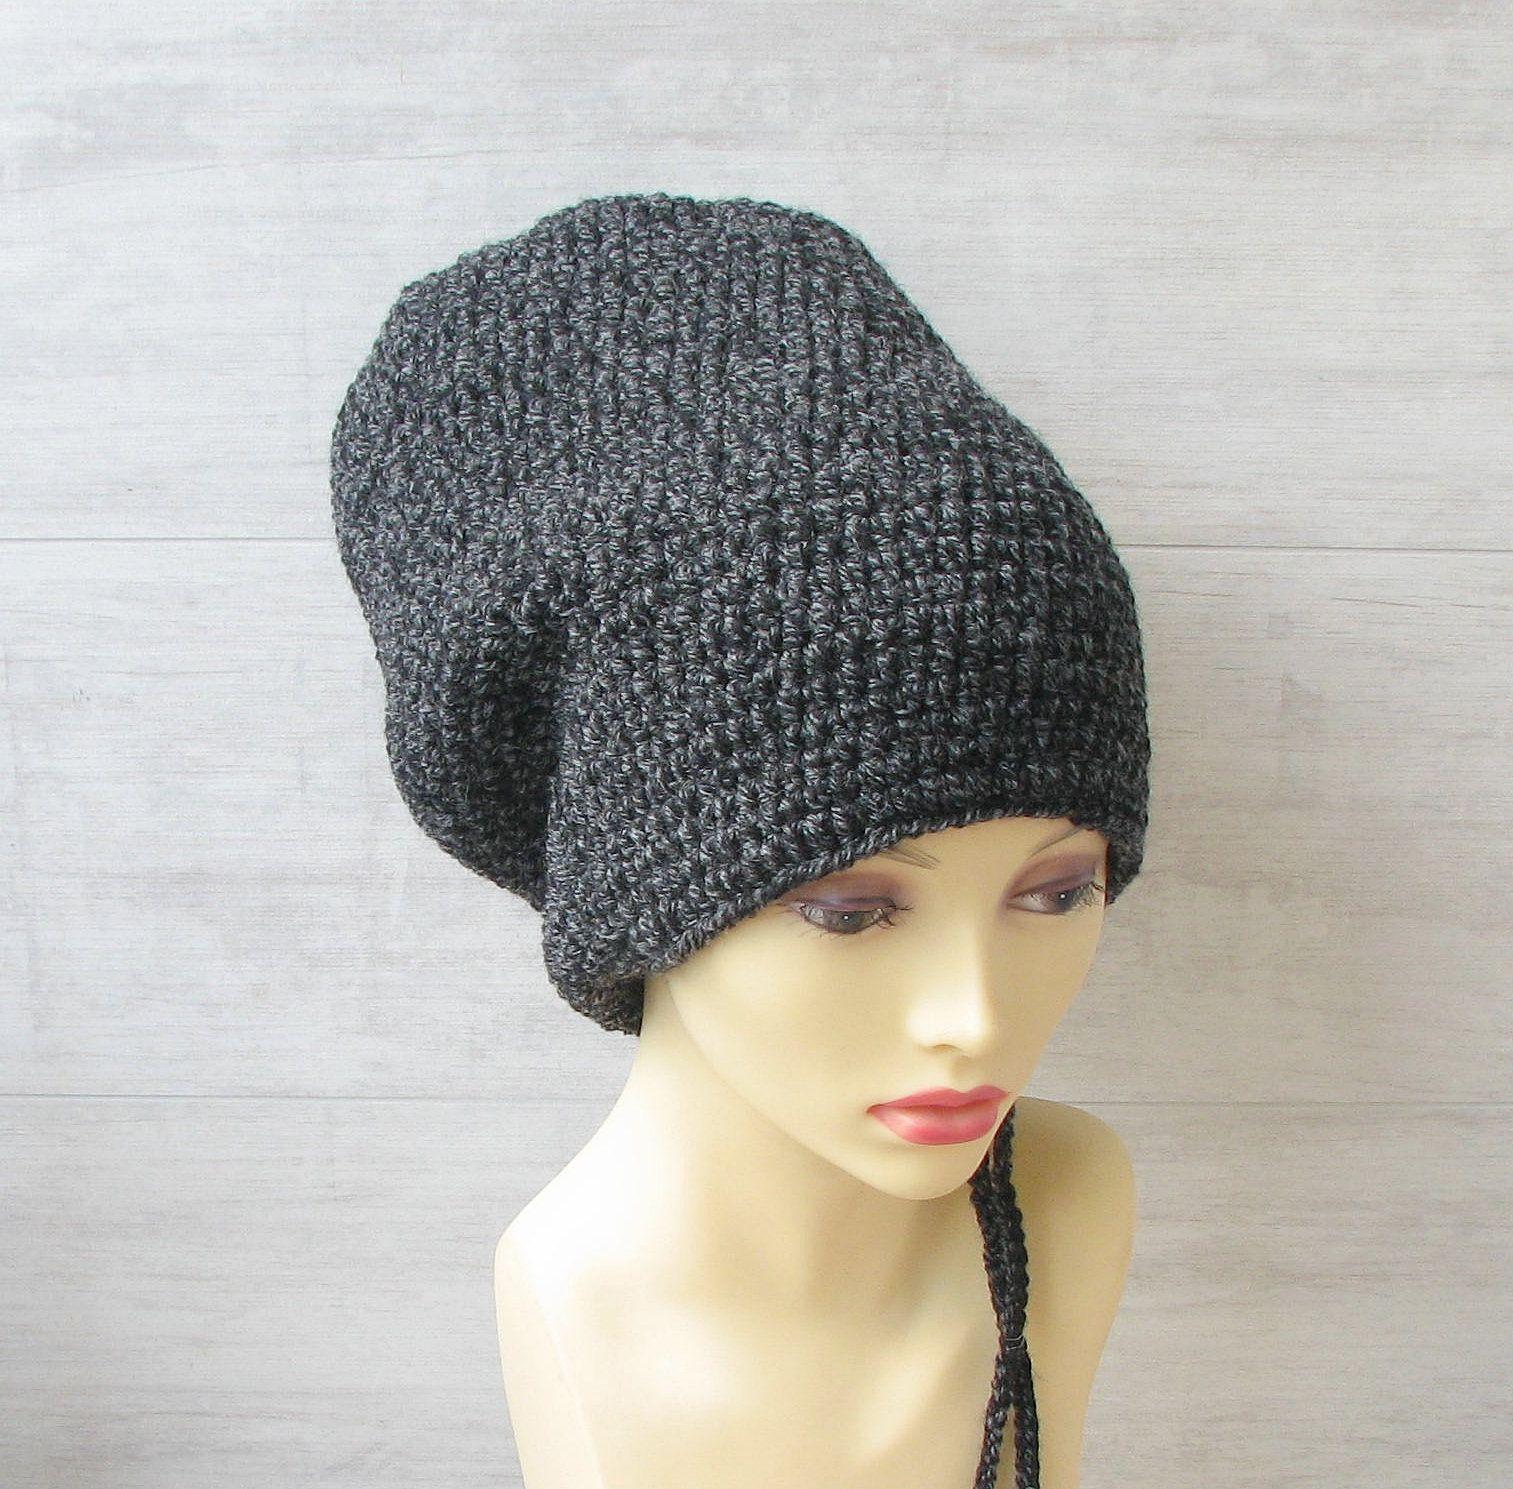 Baggy slouchy beanie Oversized hat Winter wool beanie Big head hat  XXL hat Unisex slouchy beanie Hat for dreadlocks Dreadlock beanie hat